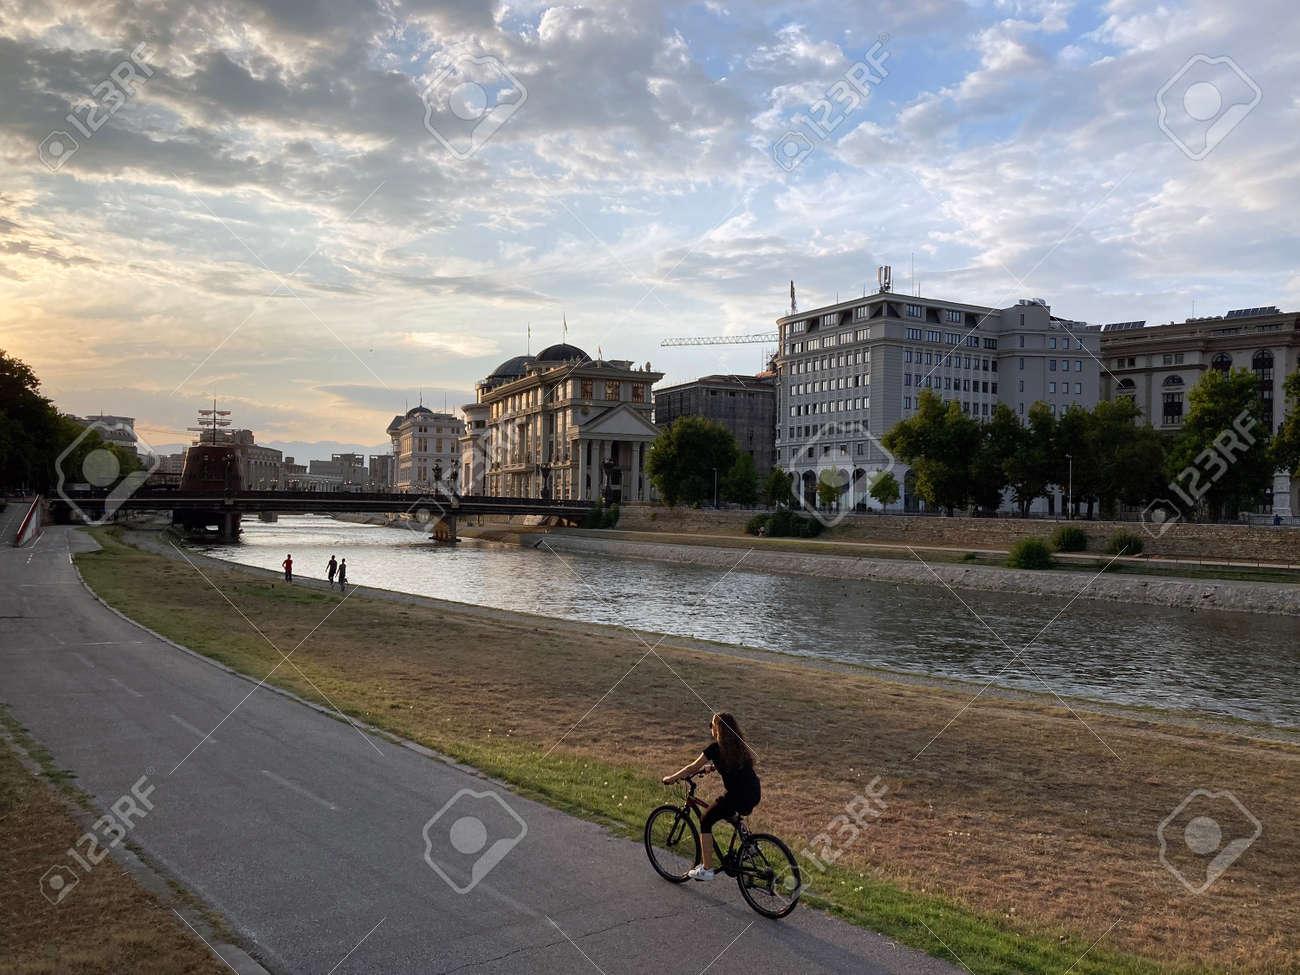 girl on bike riding in embankment during sunset - 173398995